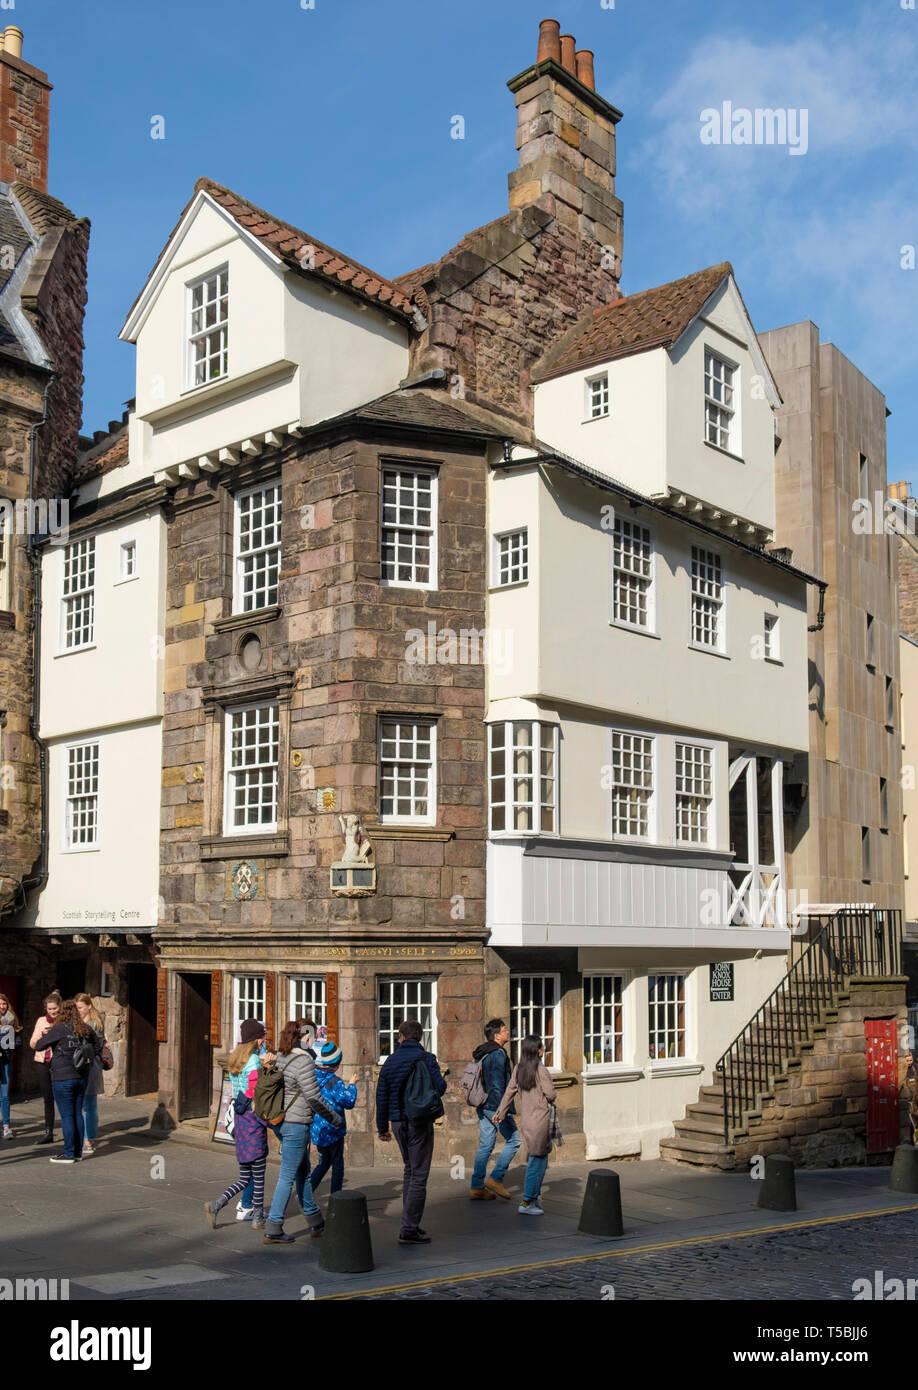 Exterior view of John Knox House on Royal Mile in Edinburgh Old Town, Scotland UK Stock Photo